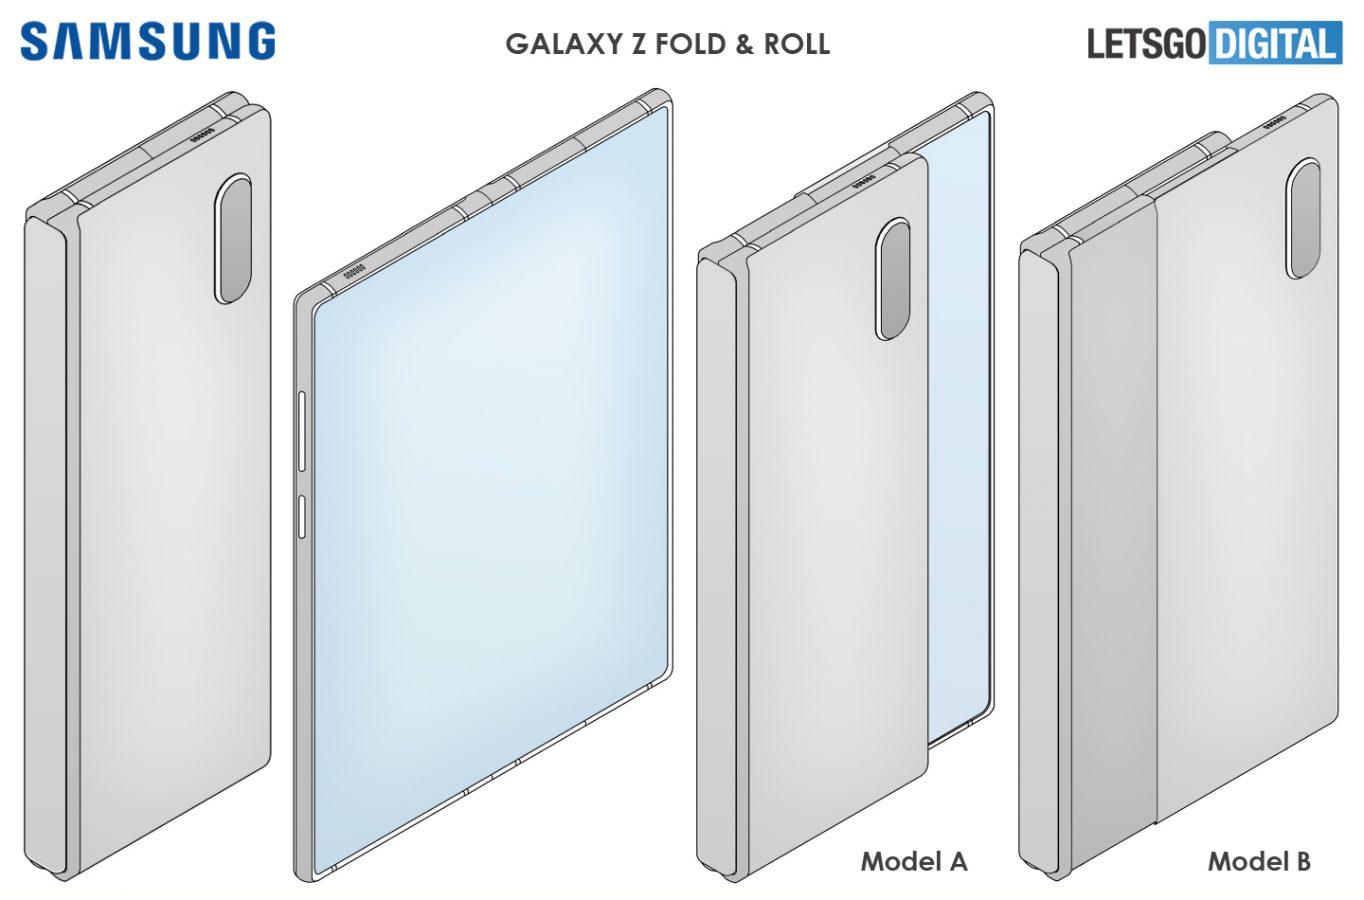 składany zwijany smartfon samsung galaxy z fold & roll foldable rollable smartphone patent